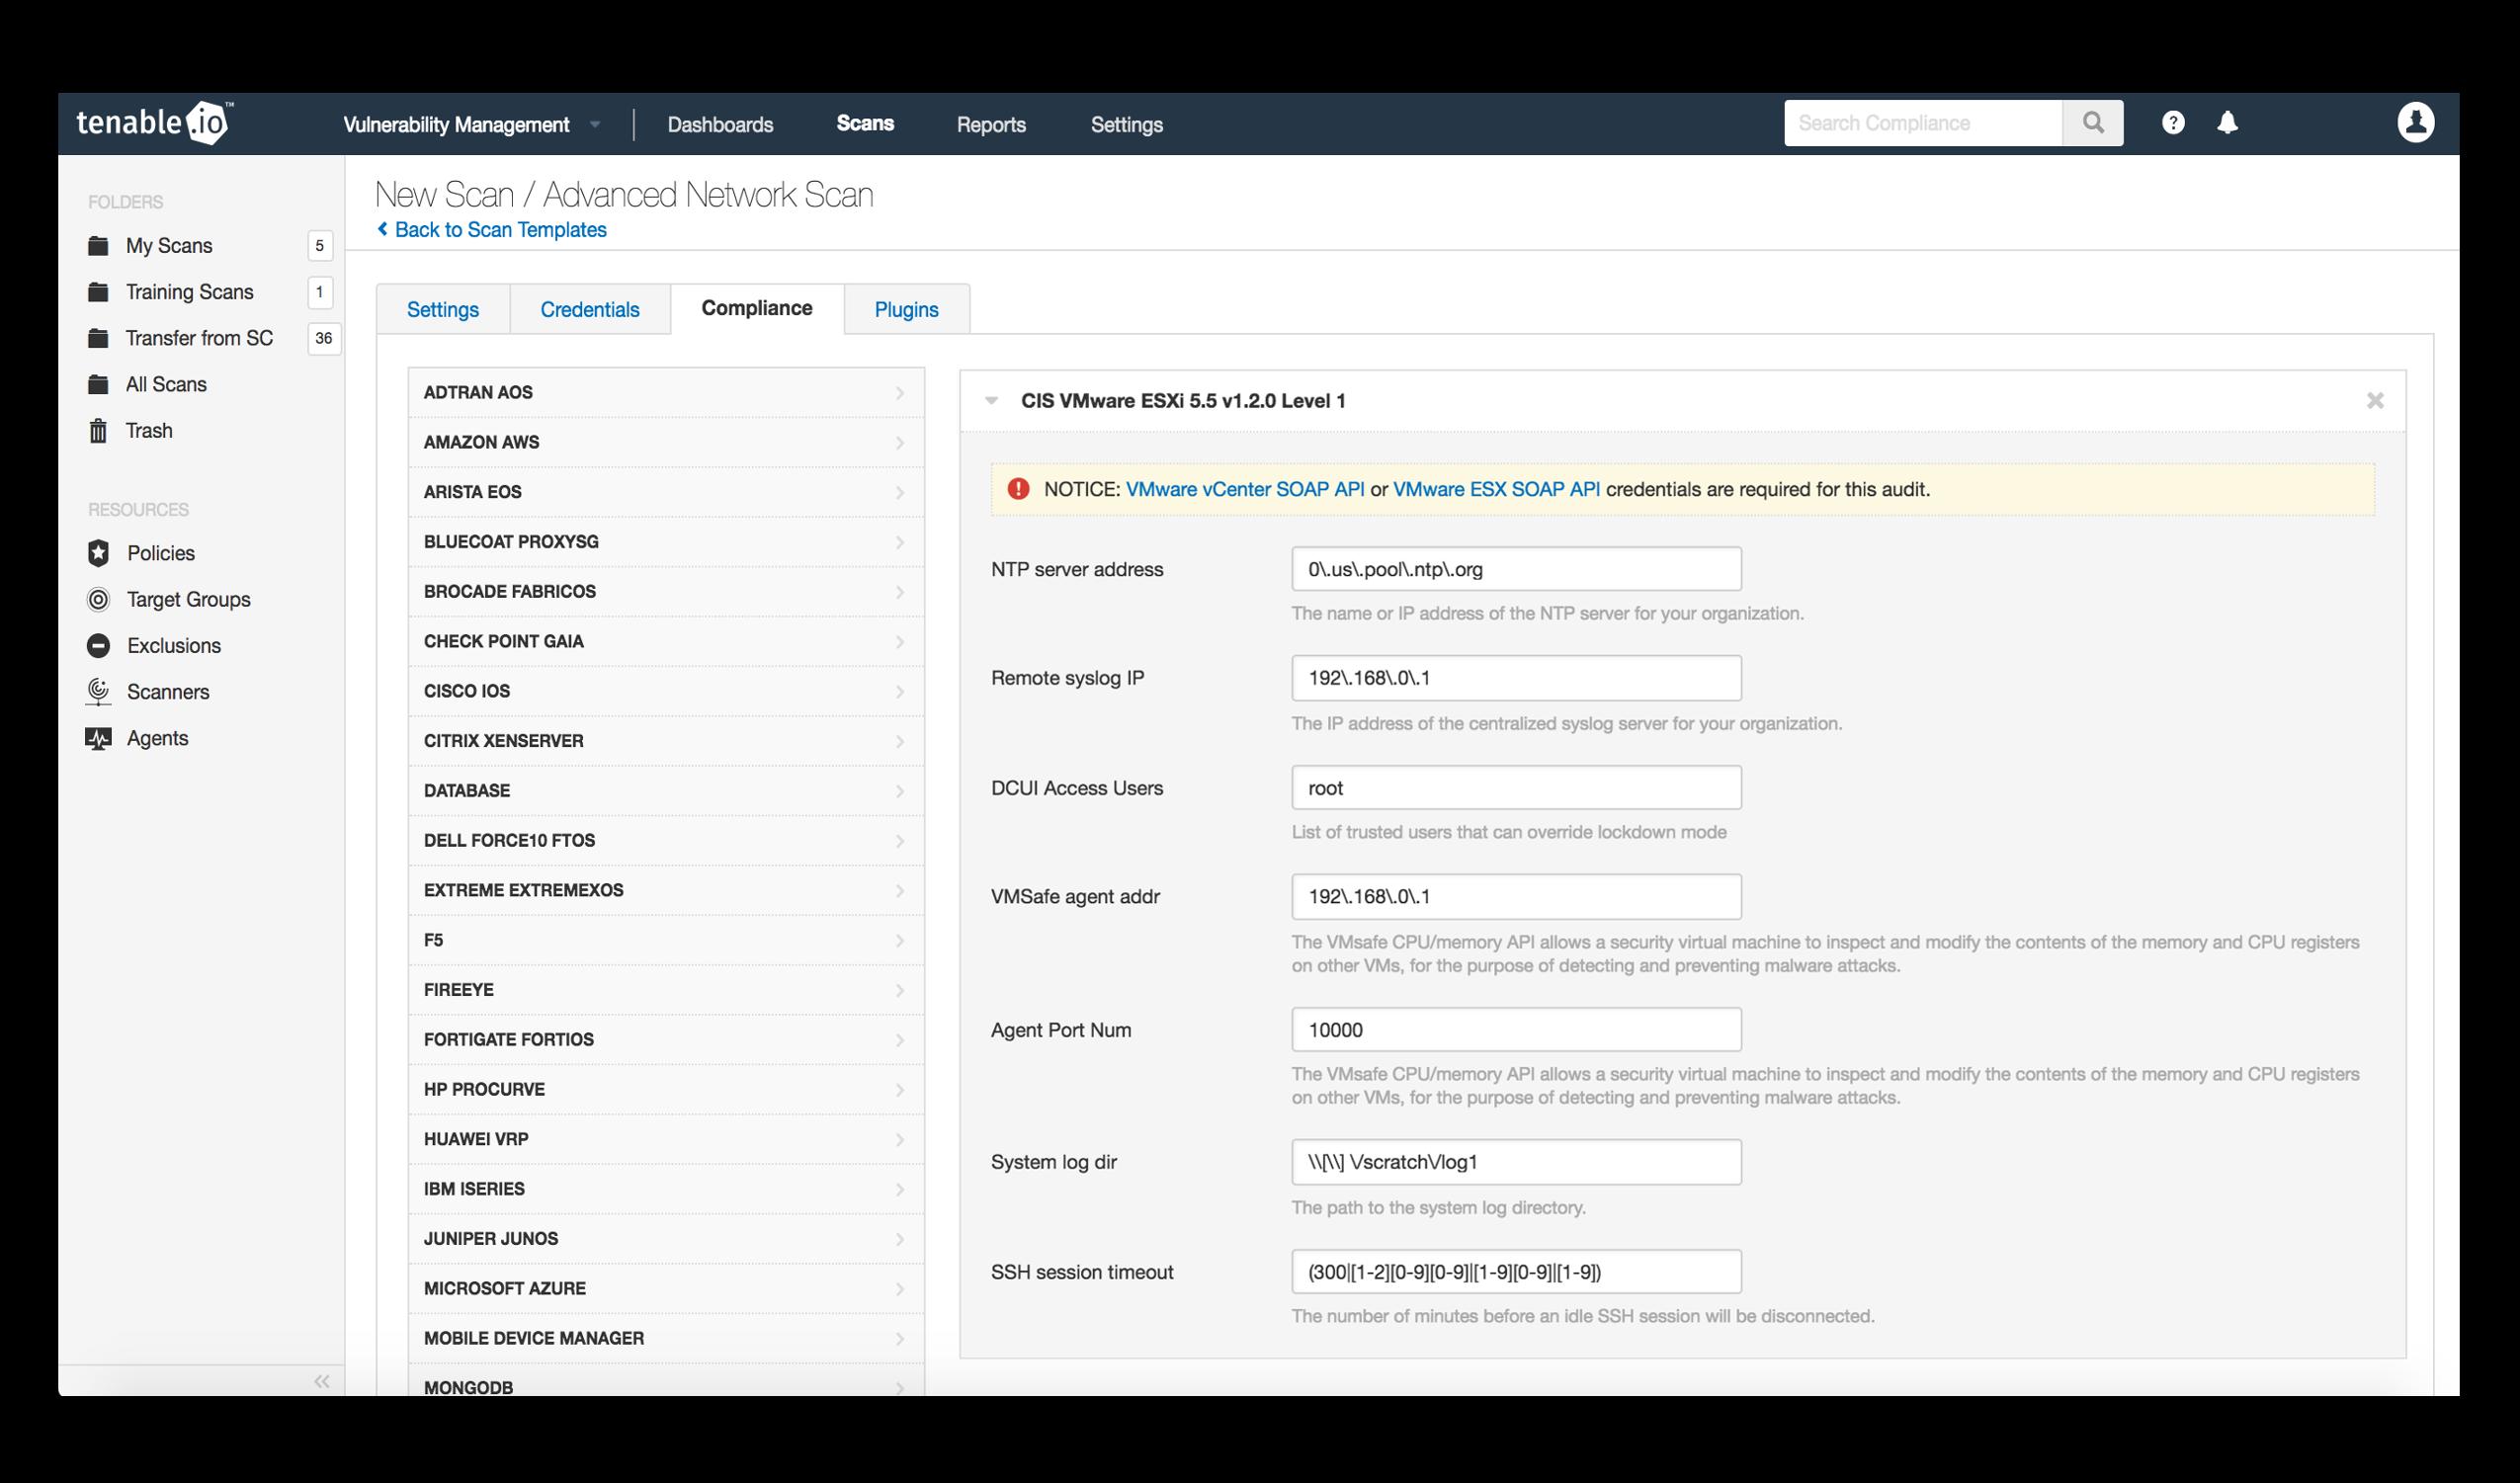 VMWare Compliance in Tenable.io